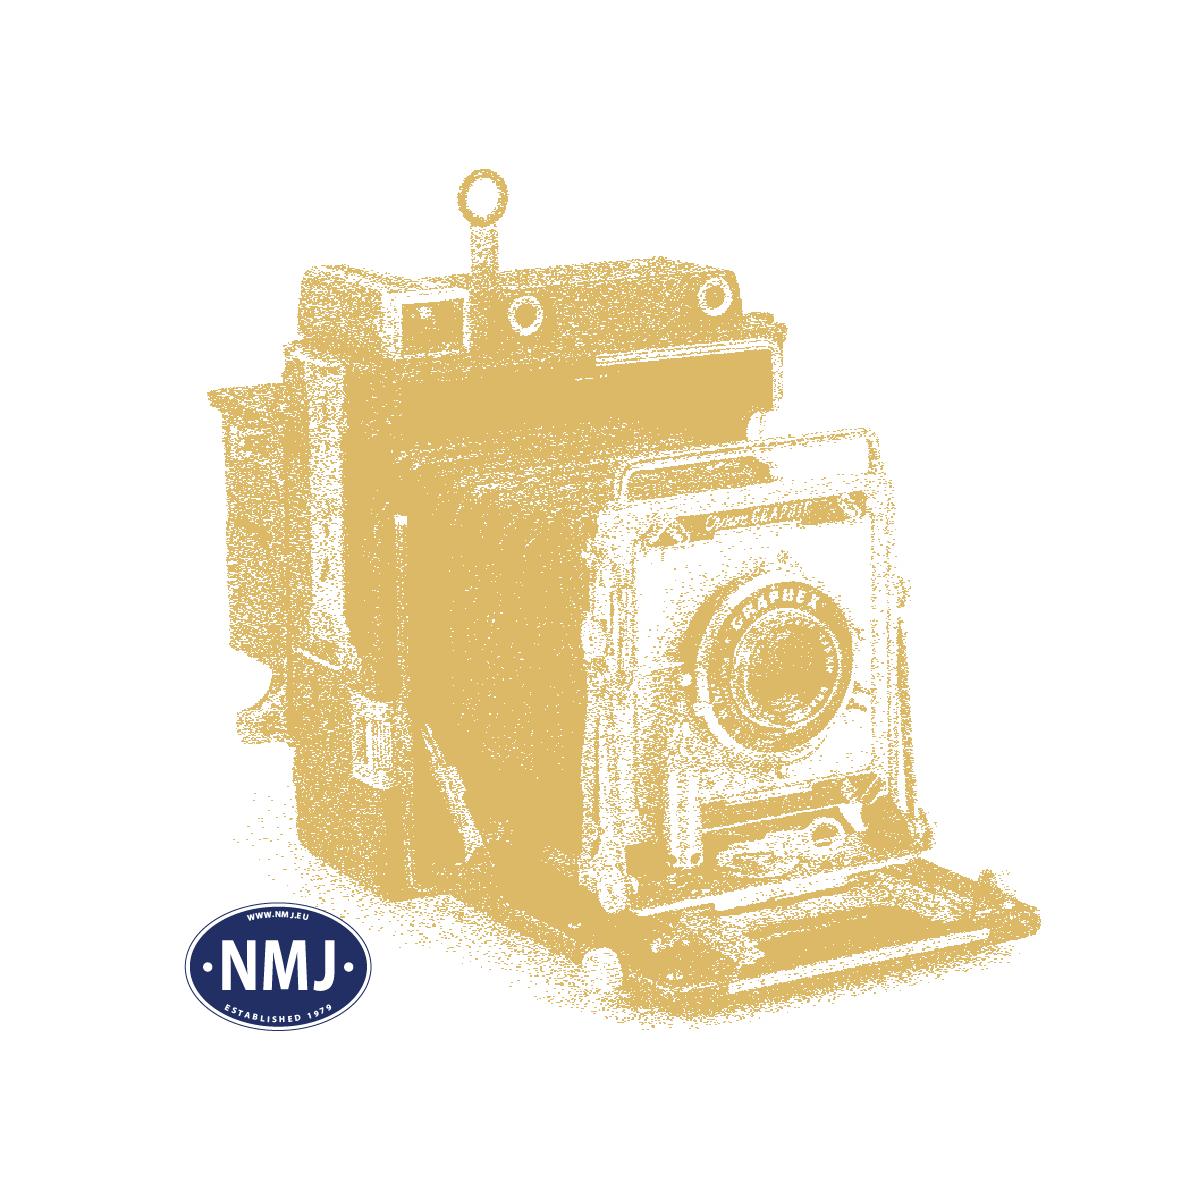 "NMJT90004 - NMJ Topline NSB Di3a.621 ""Nohab"", DCC  Sound"